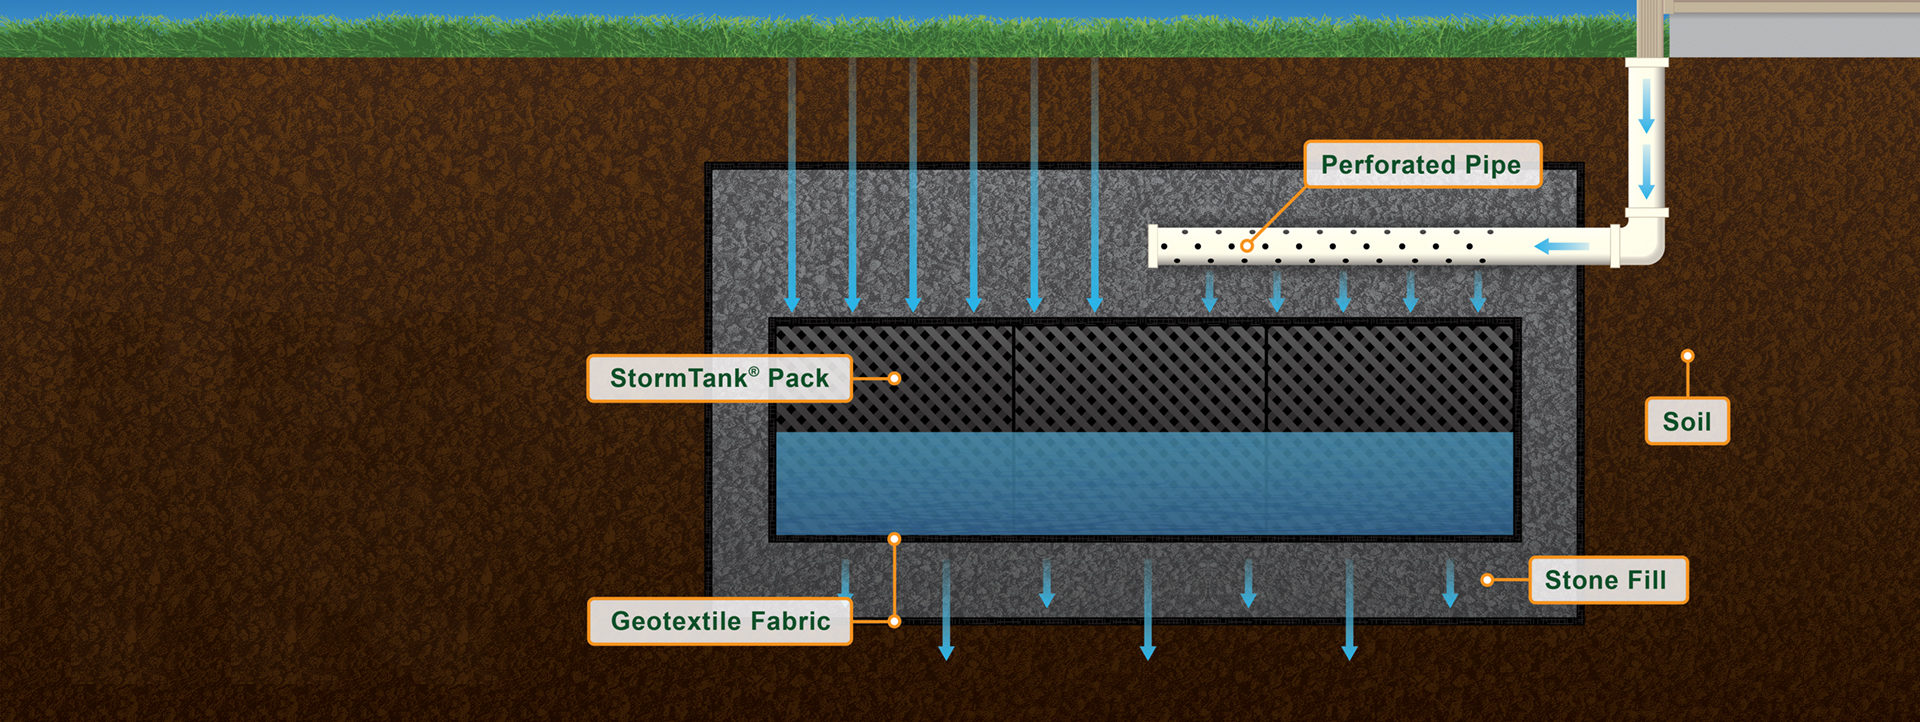 Rainwater Harvesting Solutions Diagram | Rainwater Runoff Solutions Diagram | Brentwood Industries